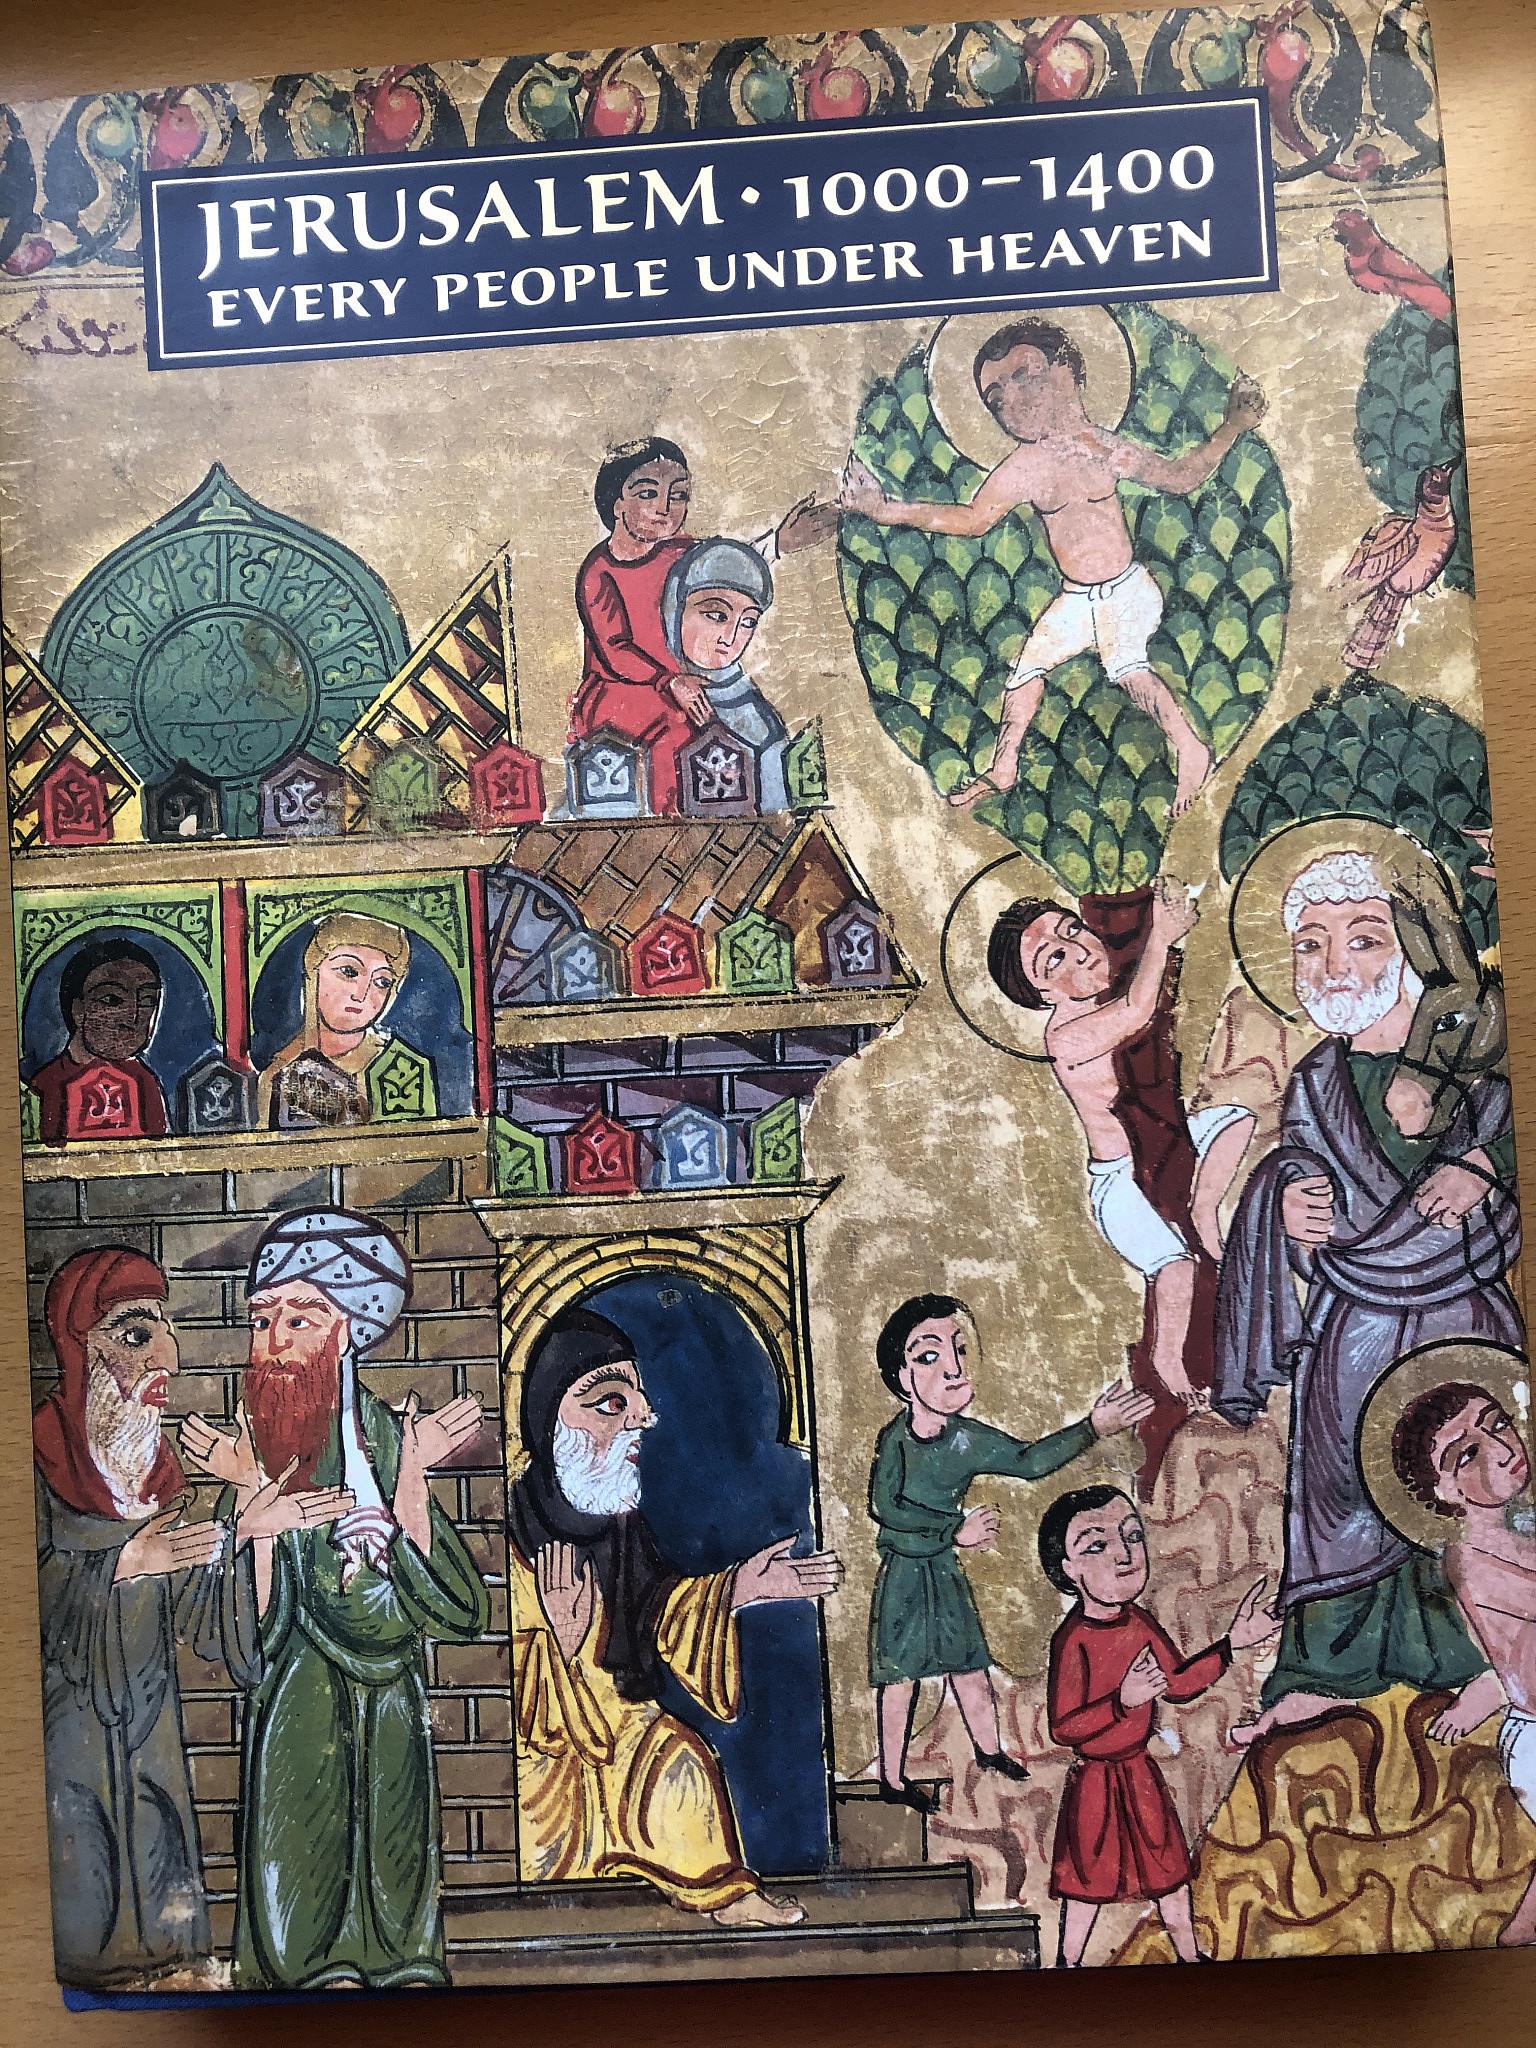 'Jerusalem 1000 – 1400; Every People Under Heaven'